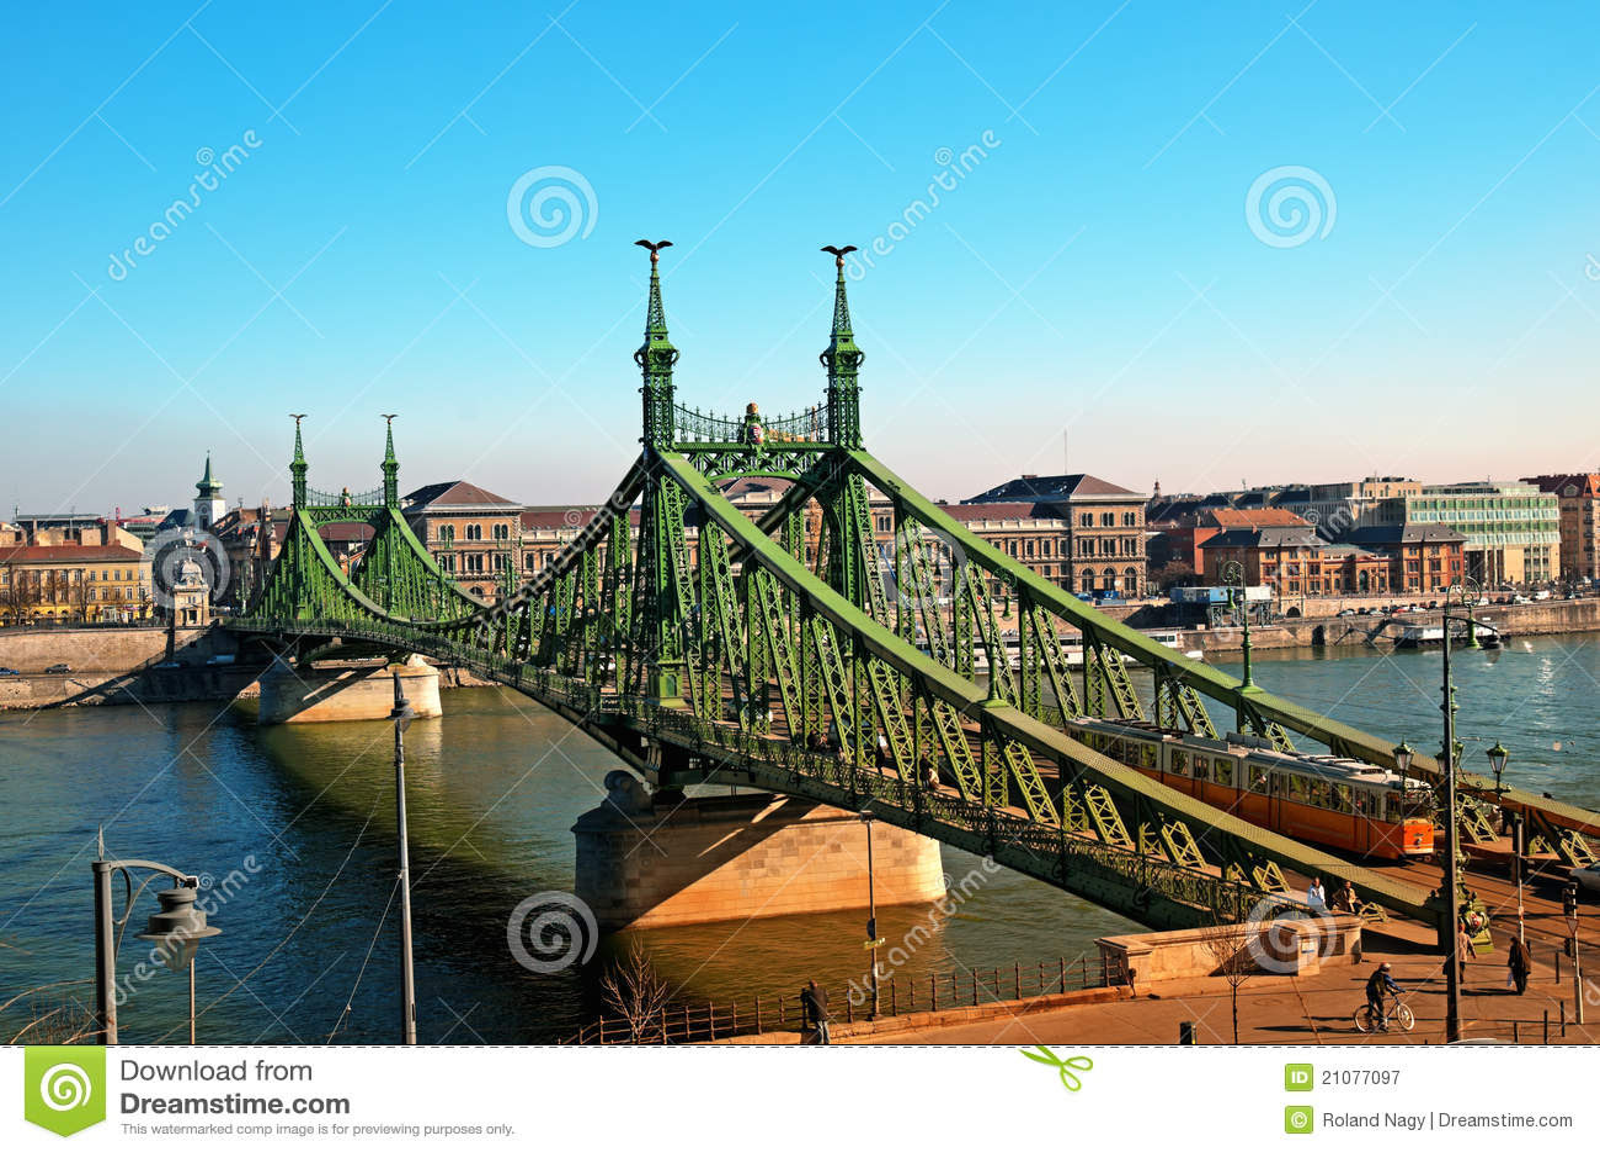 Image result for bridge in budapest